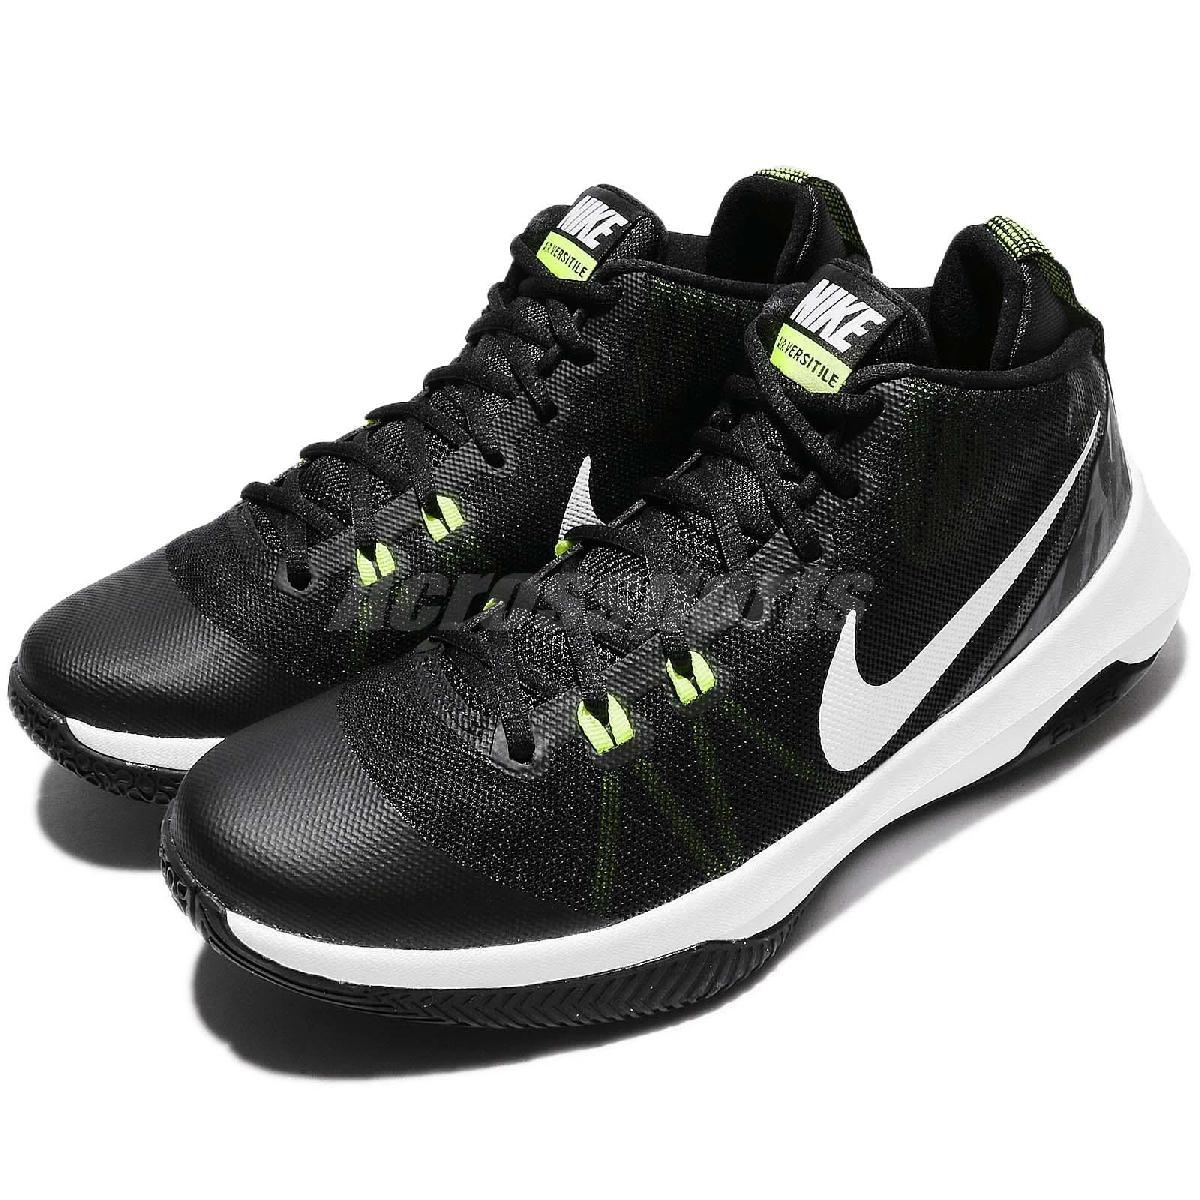 Nike籃球鞋Air Versitile黑白氣墊高筒男鞋黑白基本款運動鞋PUMP306 852431-009